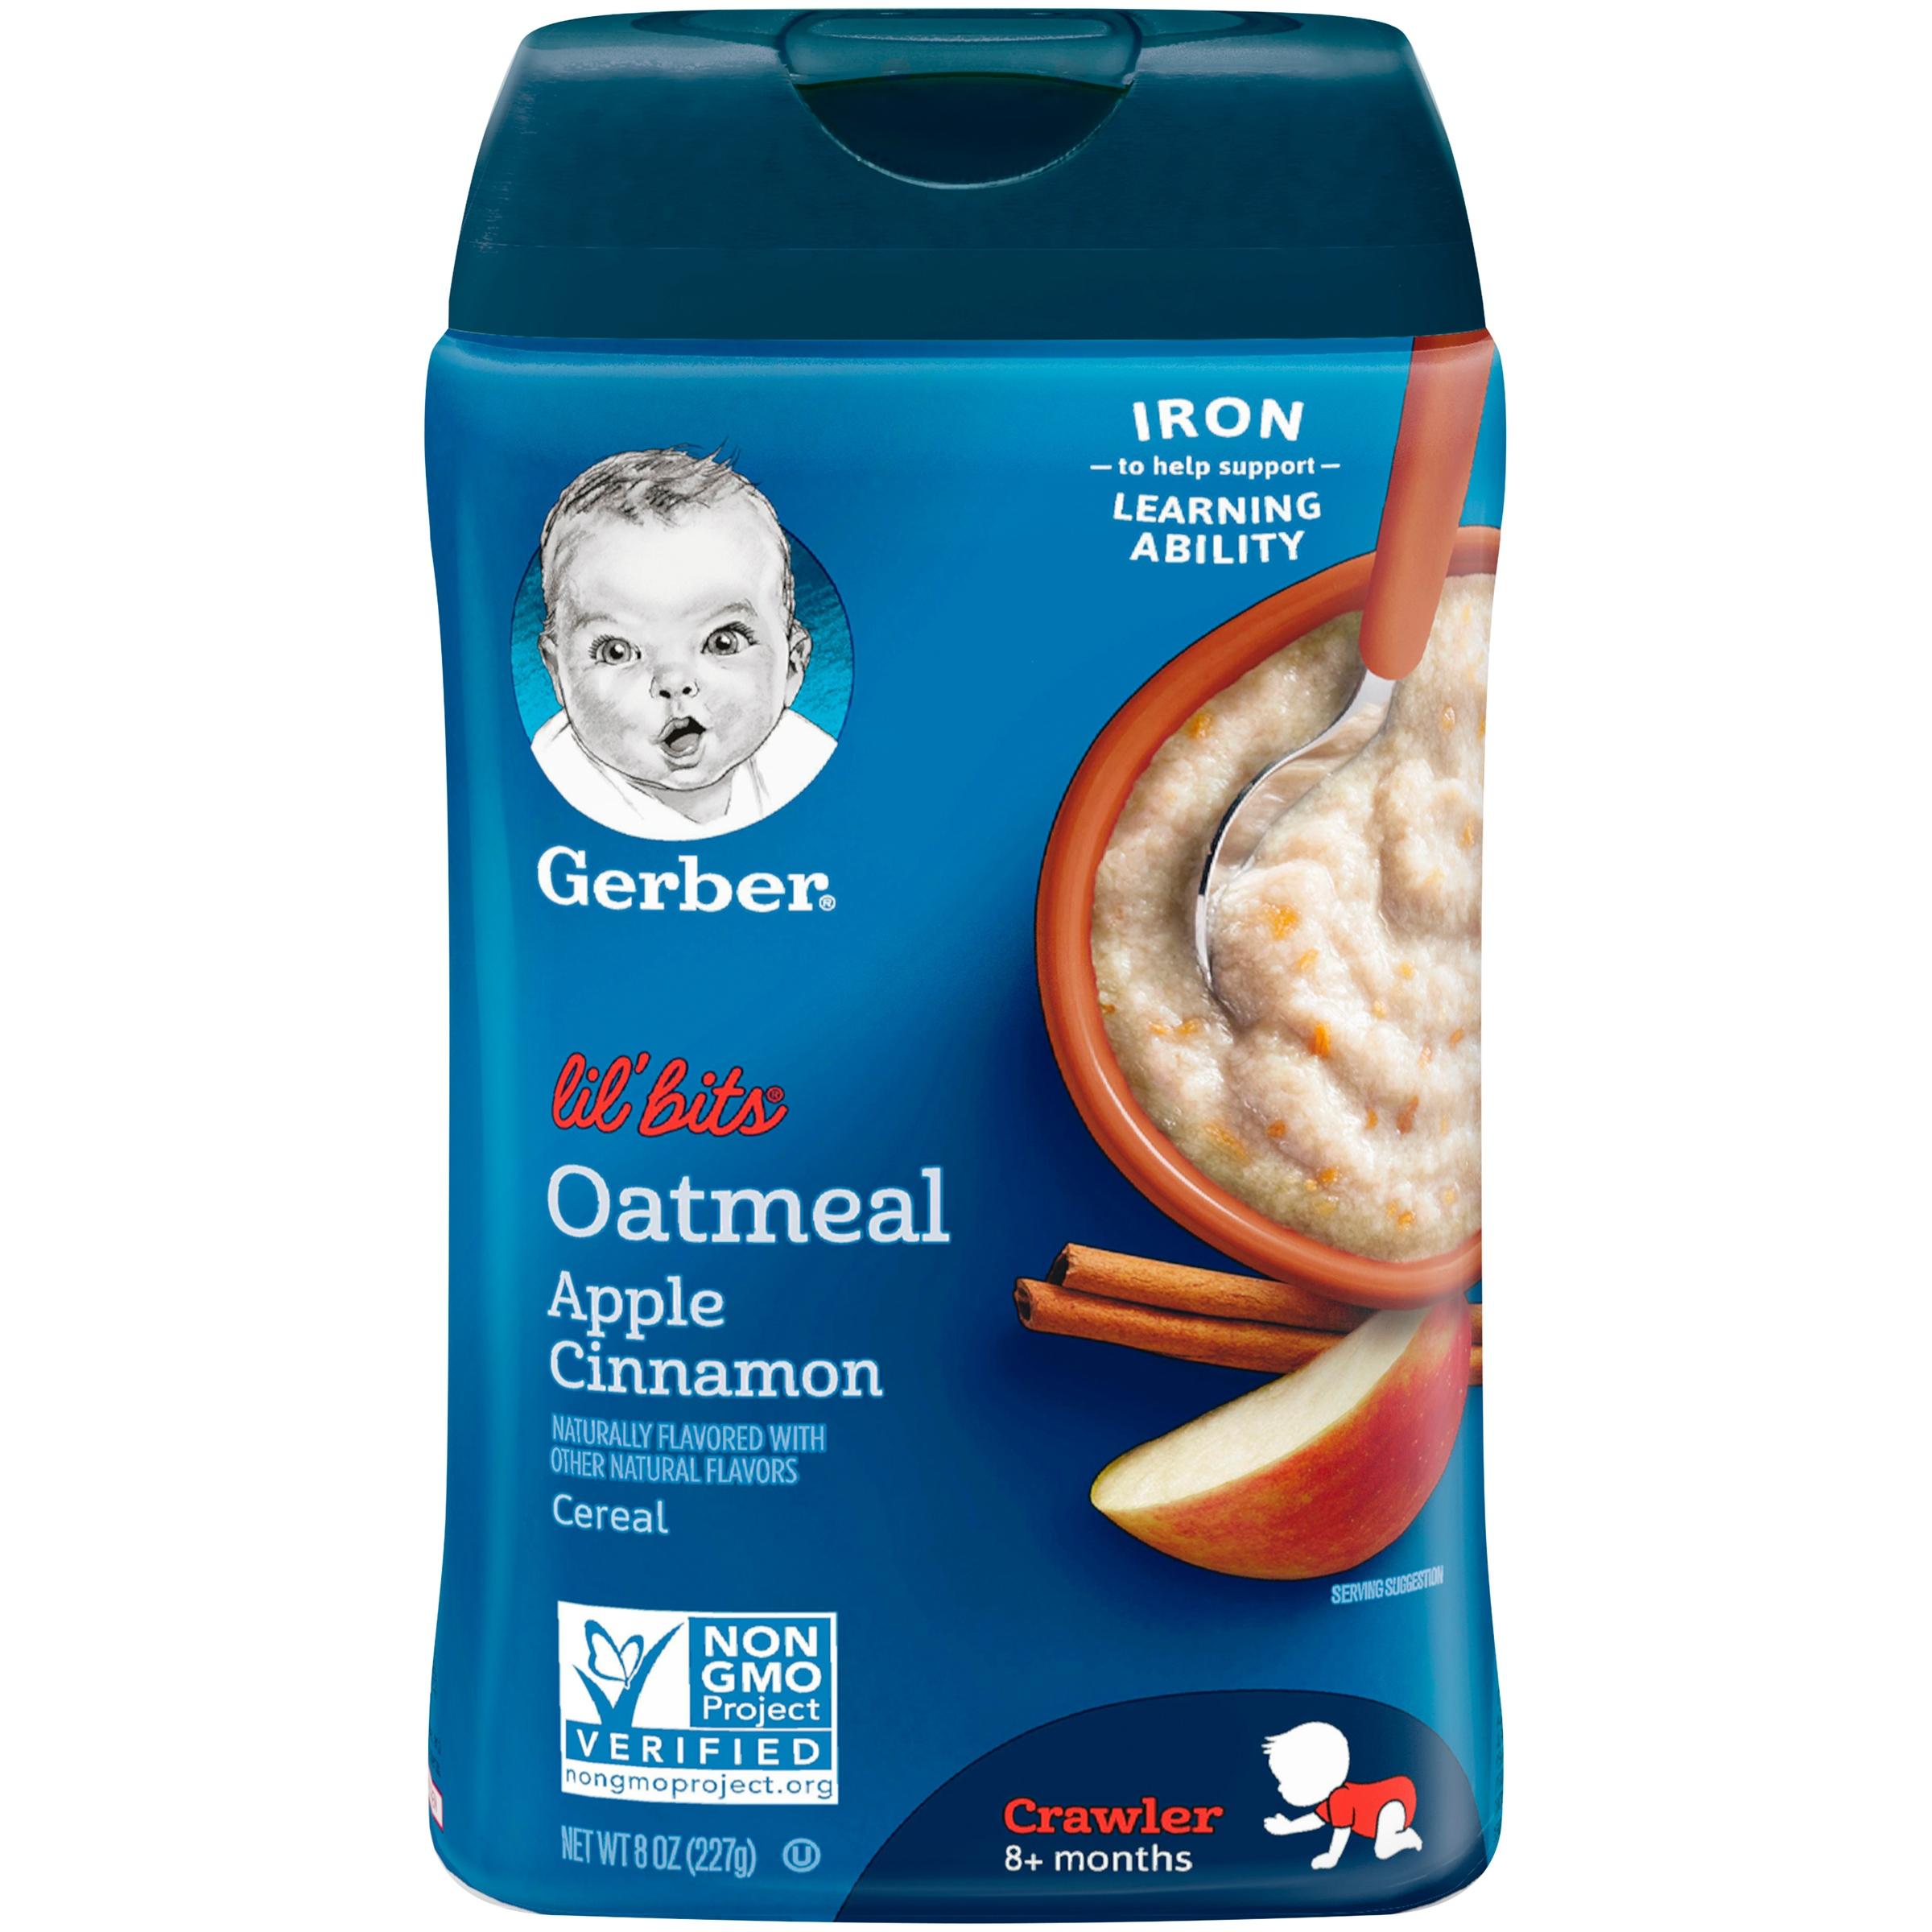 GERBER LIL' BITS Oatmeal Apple Cinnamon Baby Cereal, 8 oz